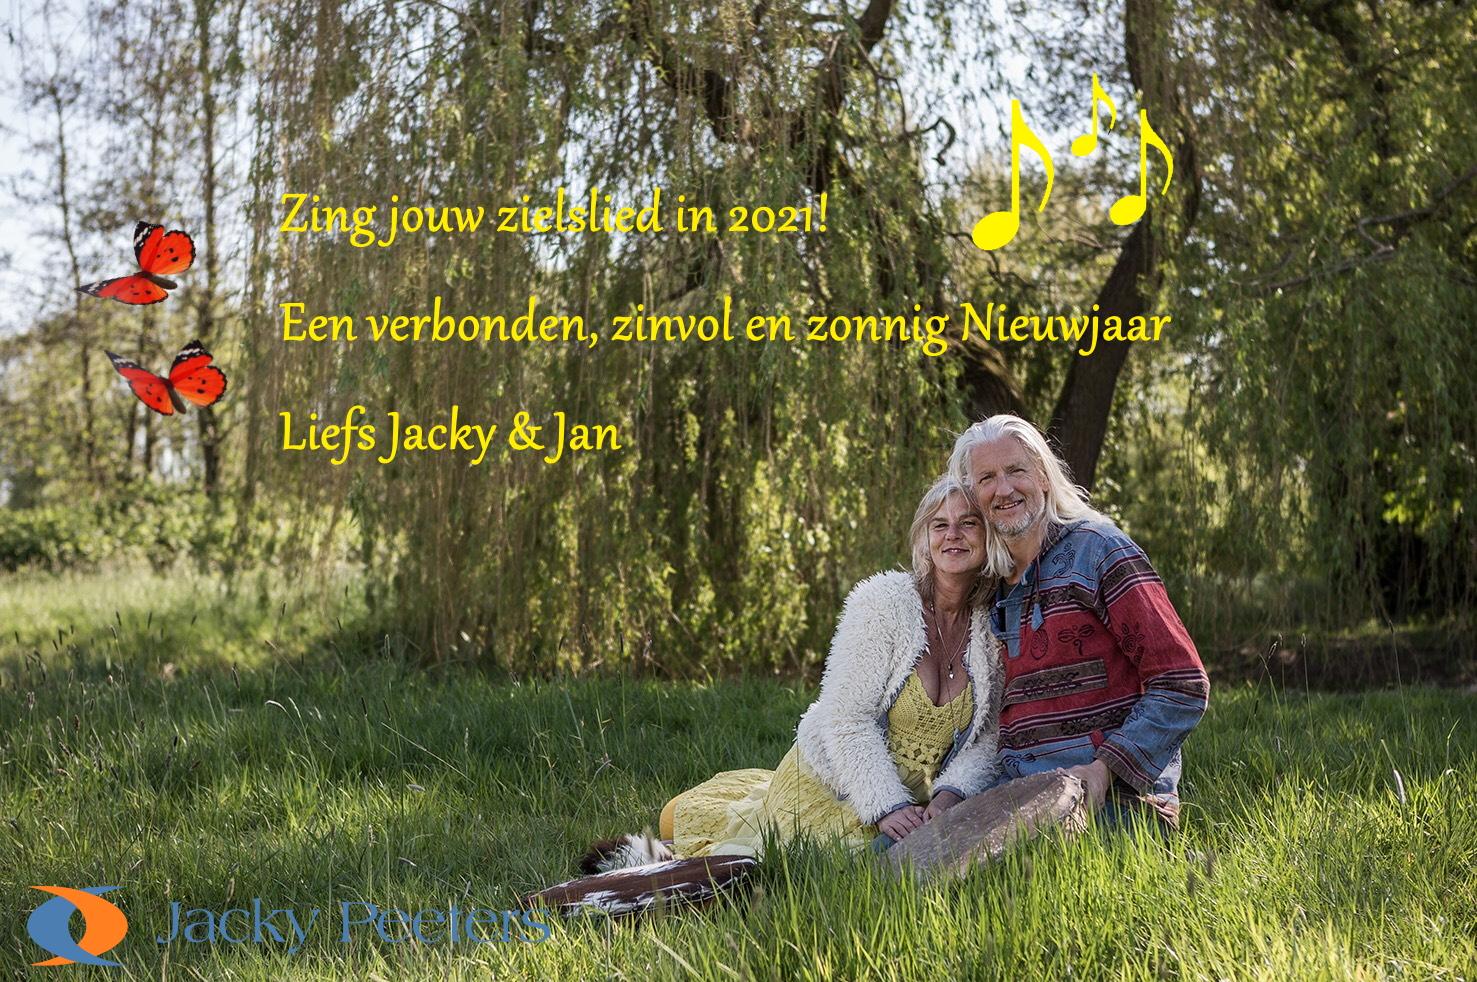 Jacky Peeters - Zing eens JAAA